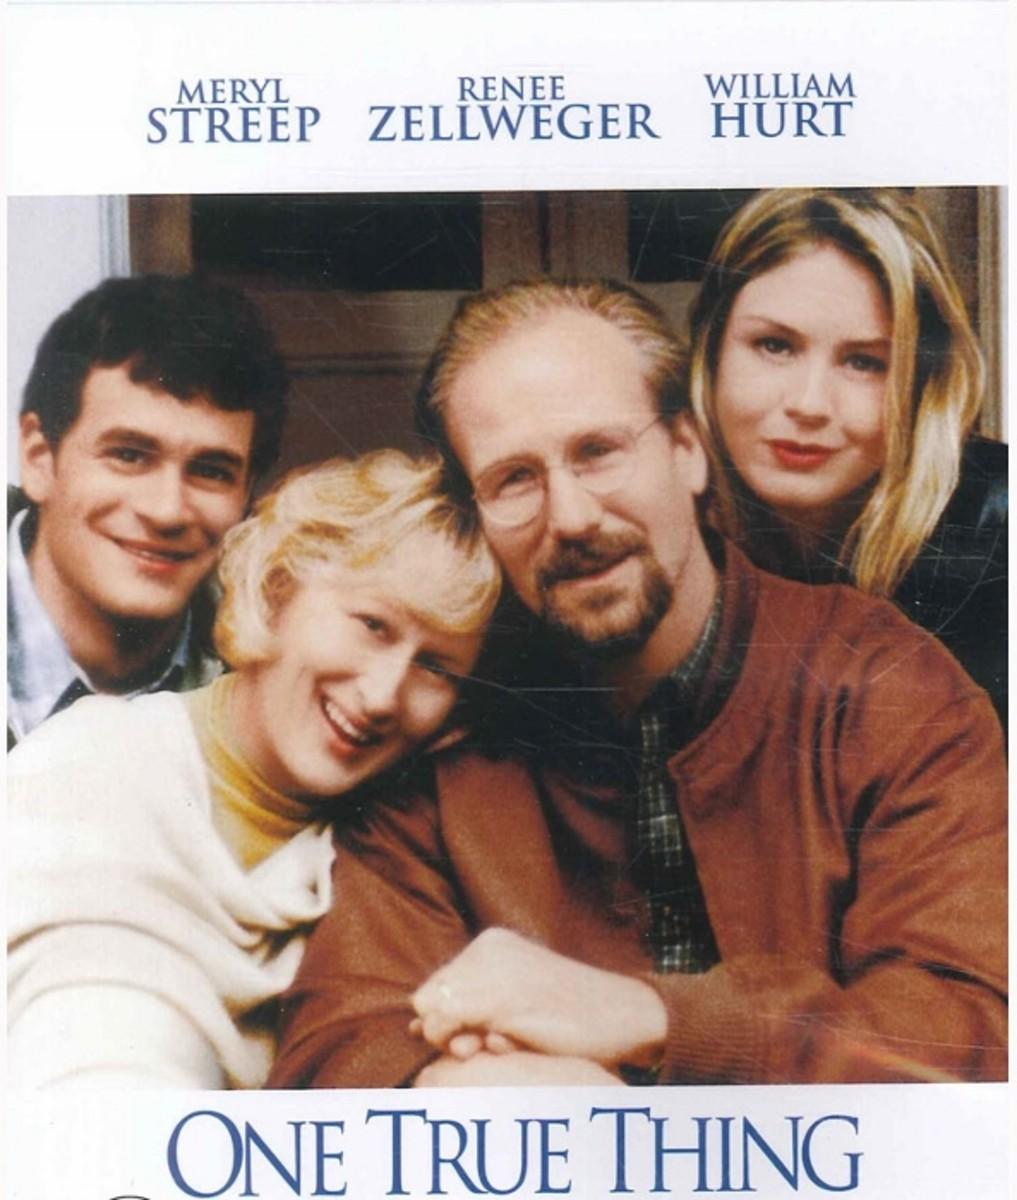 Meryl Streep is amazing in this!